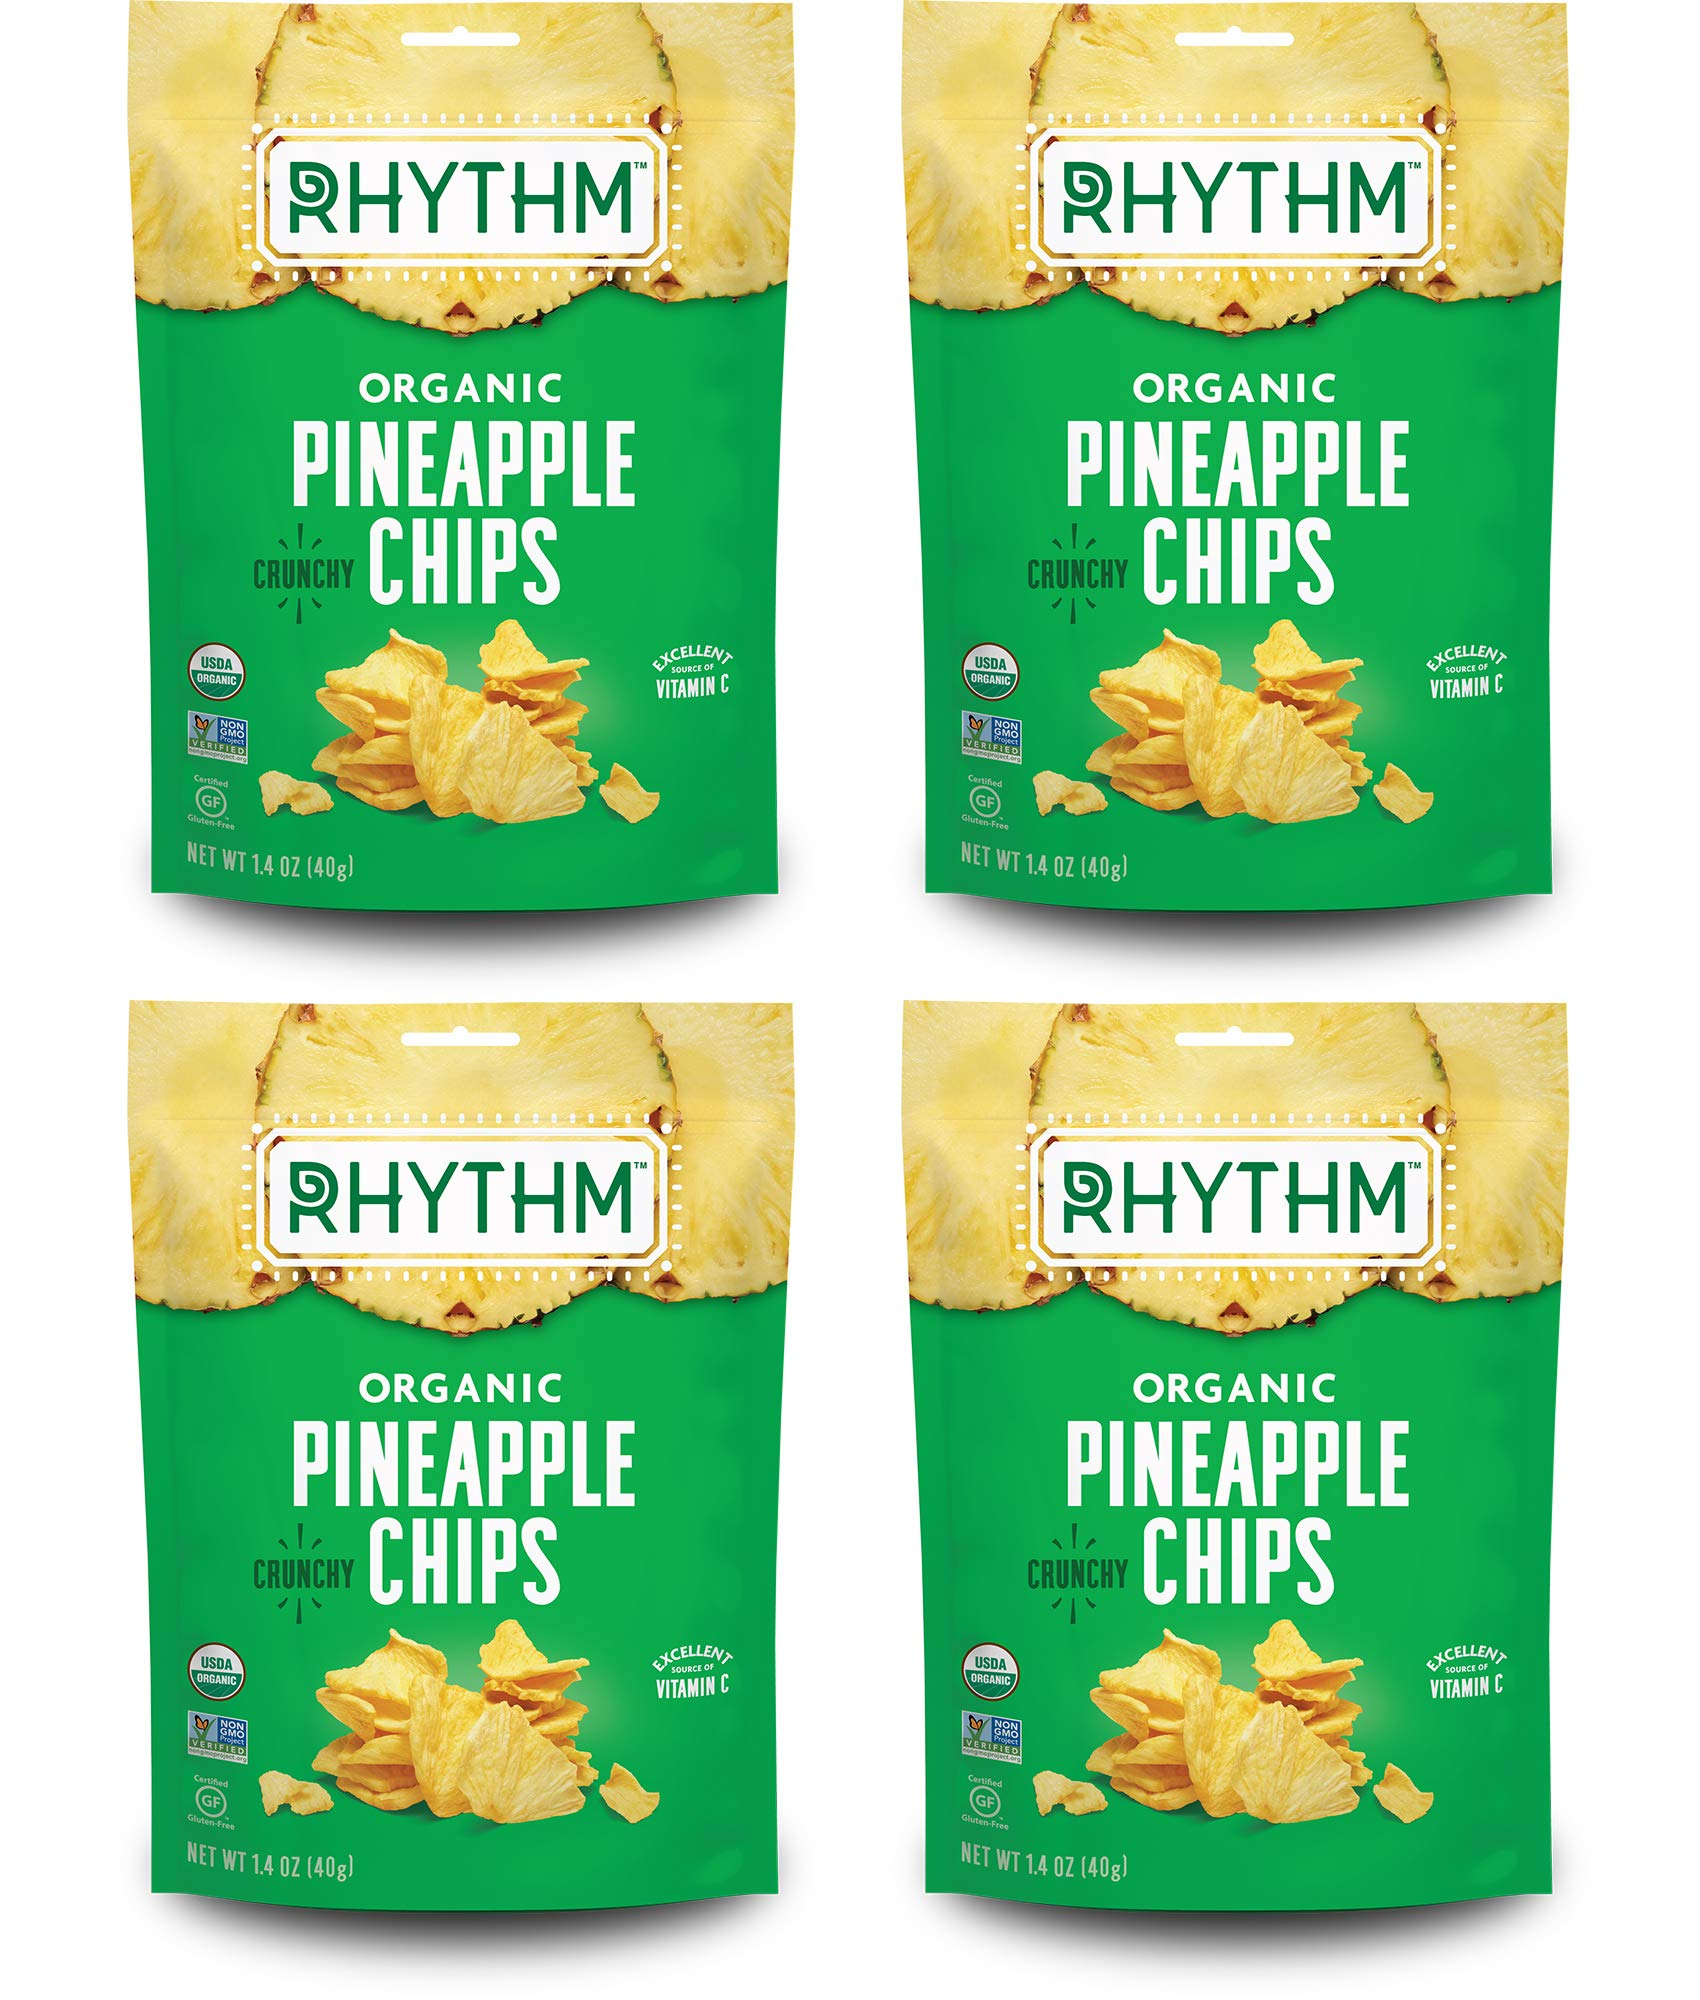 Rhythm Superfoods Crunchy Pineapple Bites, Organic & Non-GMO, 1.4 Oz (Pack Of 4), Vegan/Gluten-Free Dehydrated Sweet Fruit Snacks